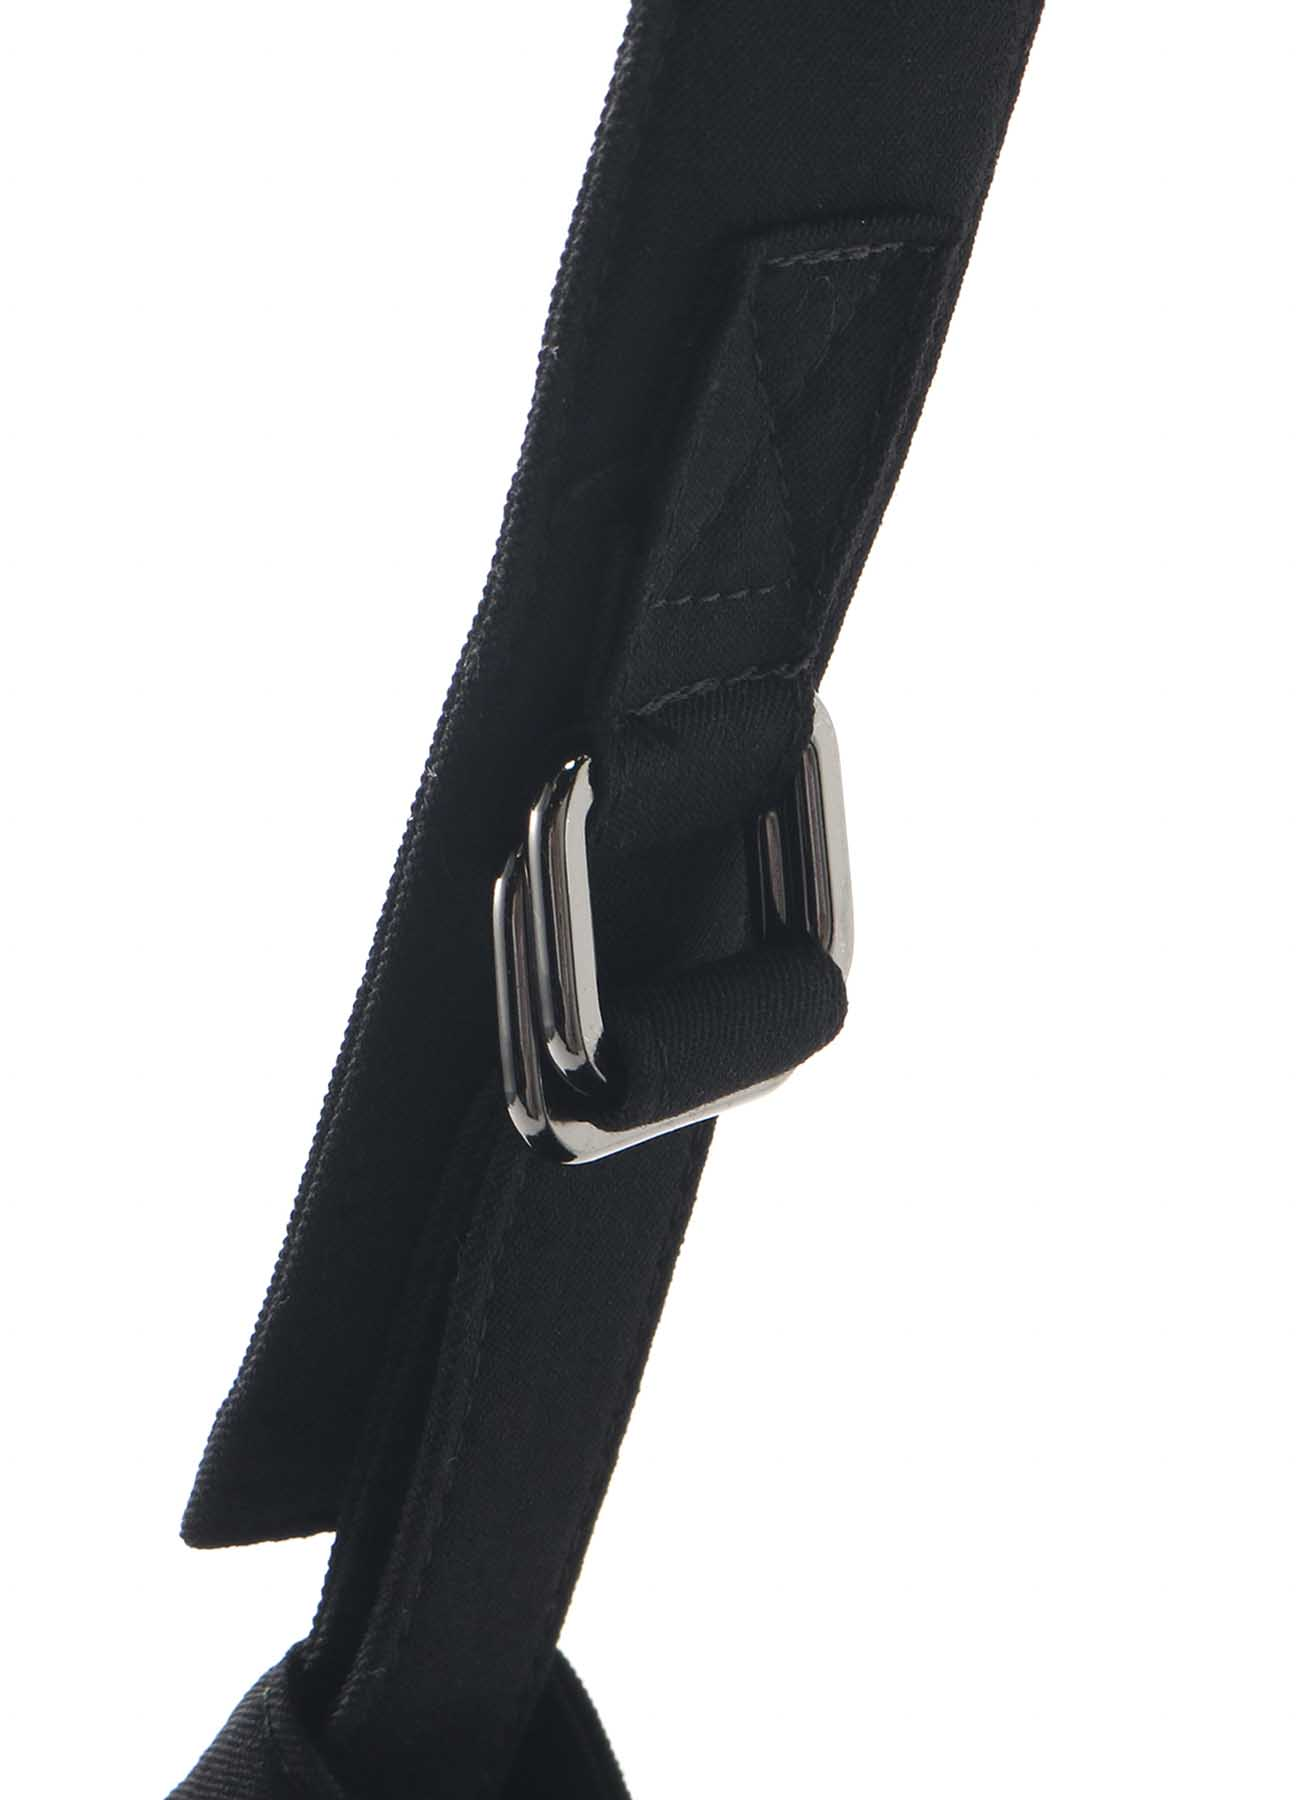 Unevennss shoulder(Gabardine)